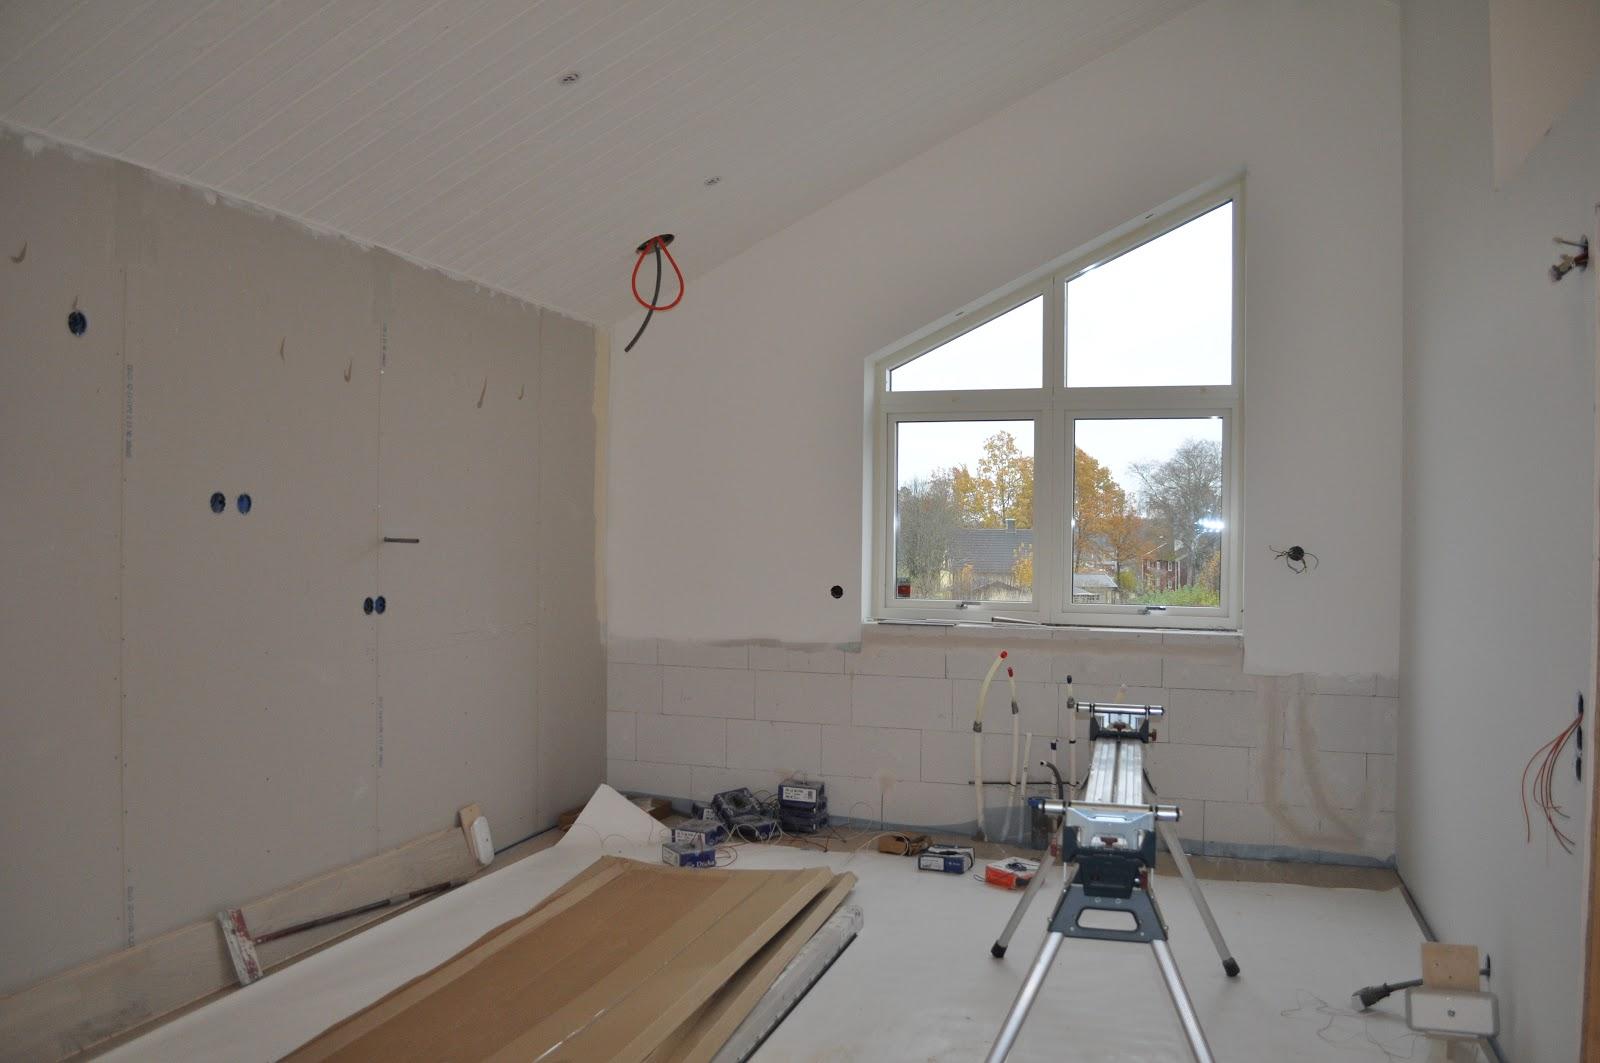 Uffes bygg: november 2012